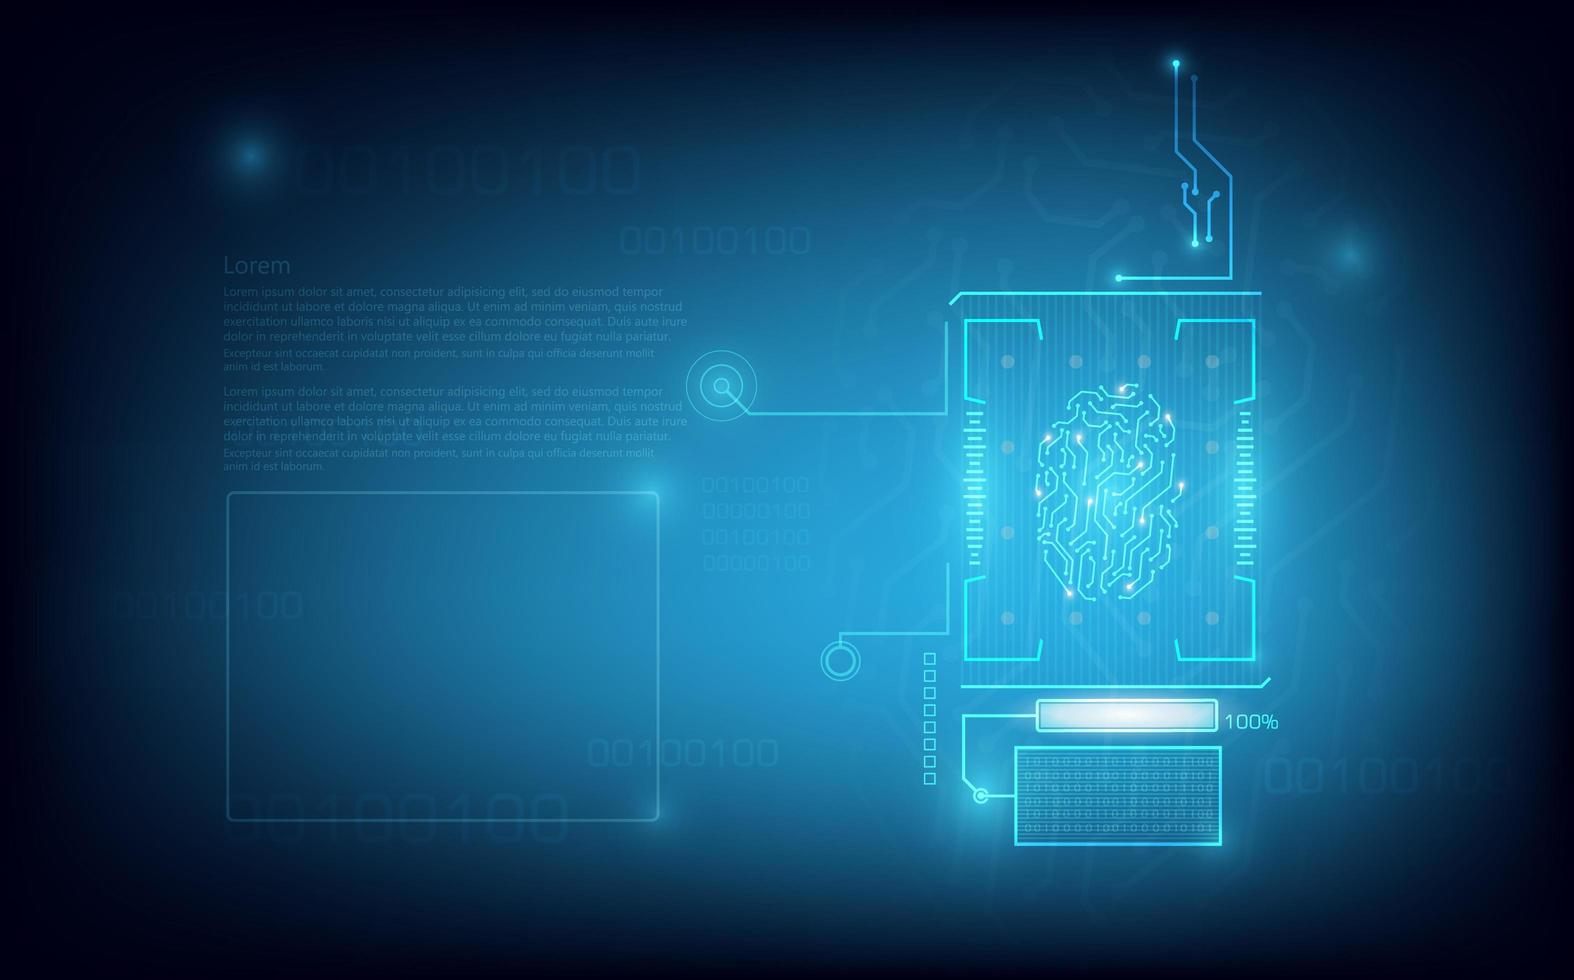 Elemente der Fingerabdruck-Scan-Technologie vektor